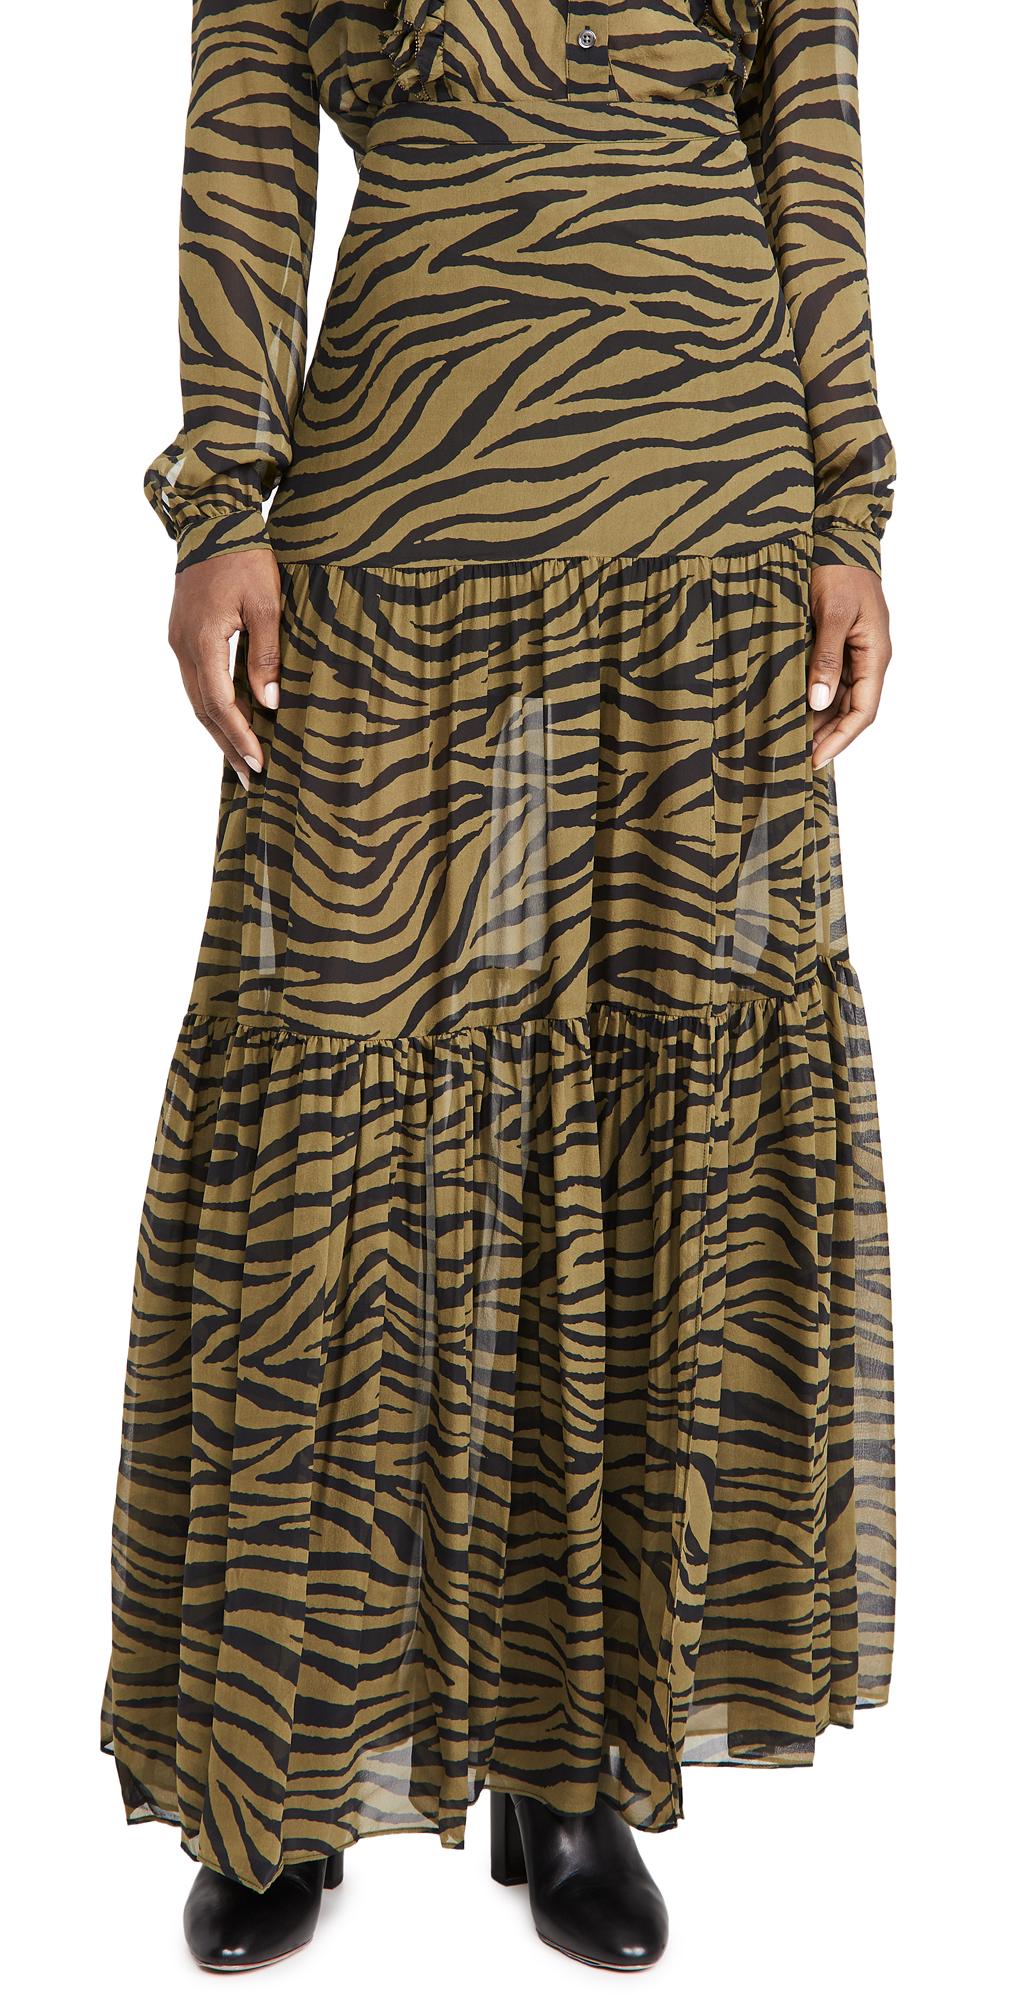 Veronica Beard Serence Skirt